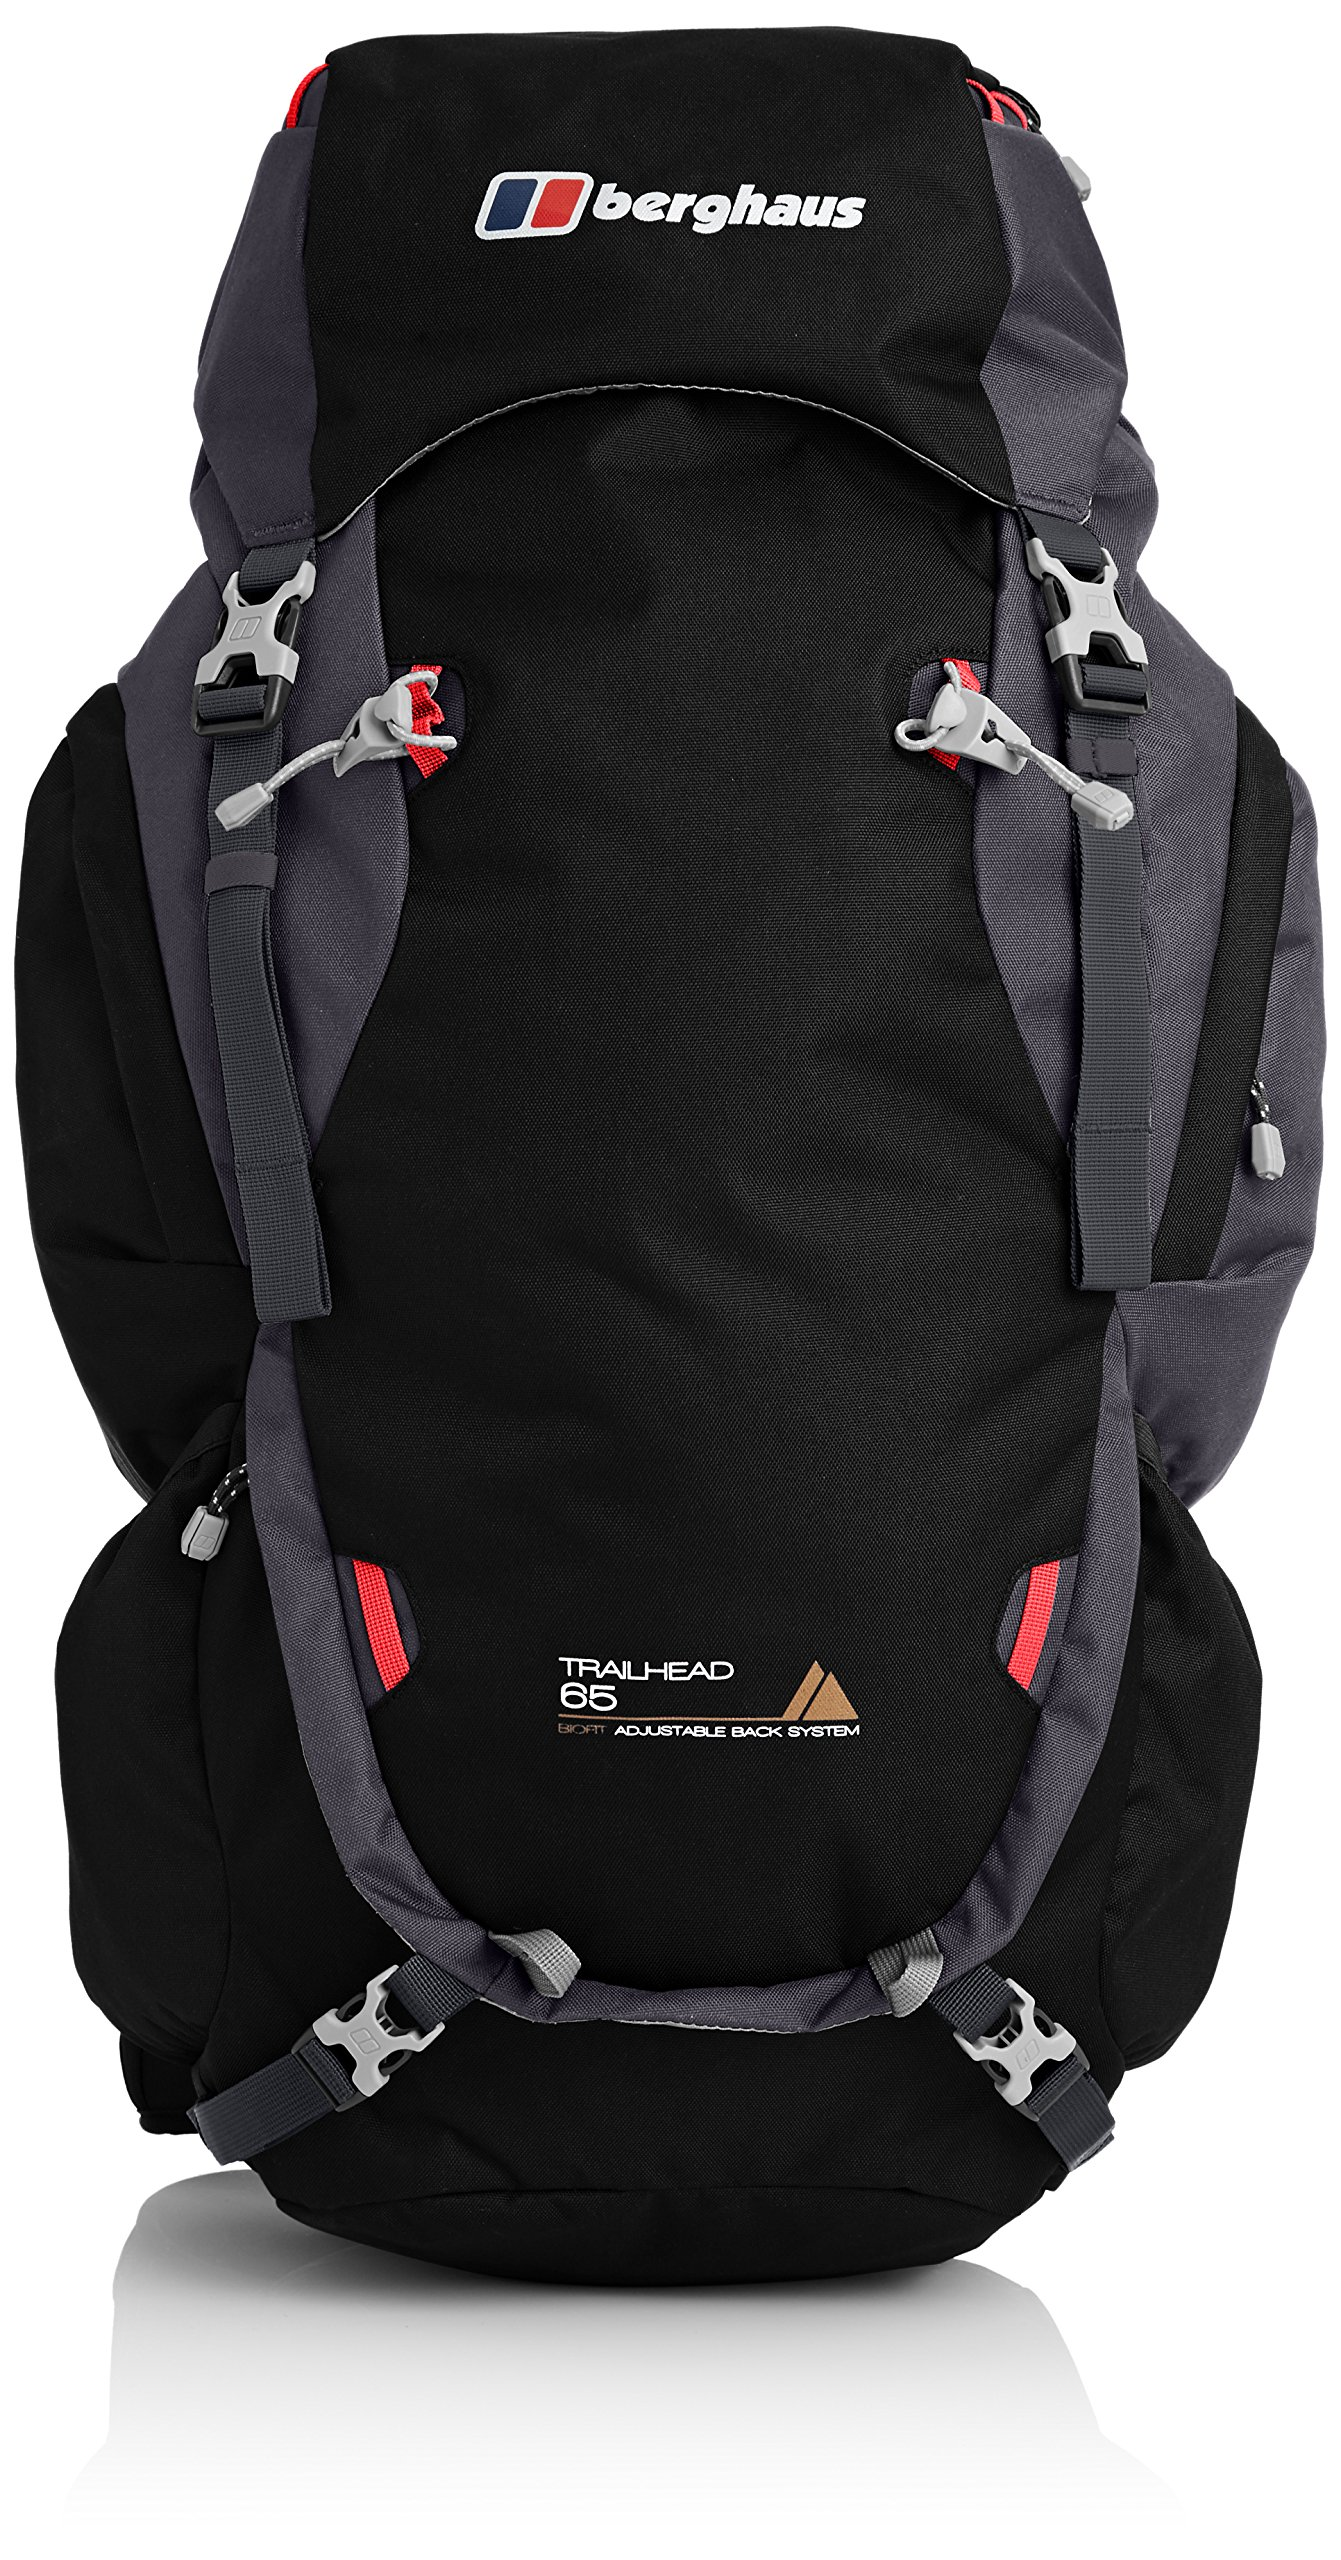 Berghaus Trailhead 65 L Rucksack, Jet Black/Carbon, One Size